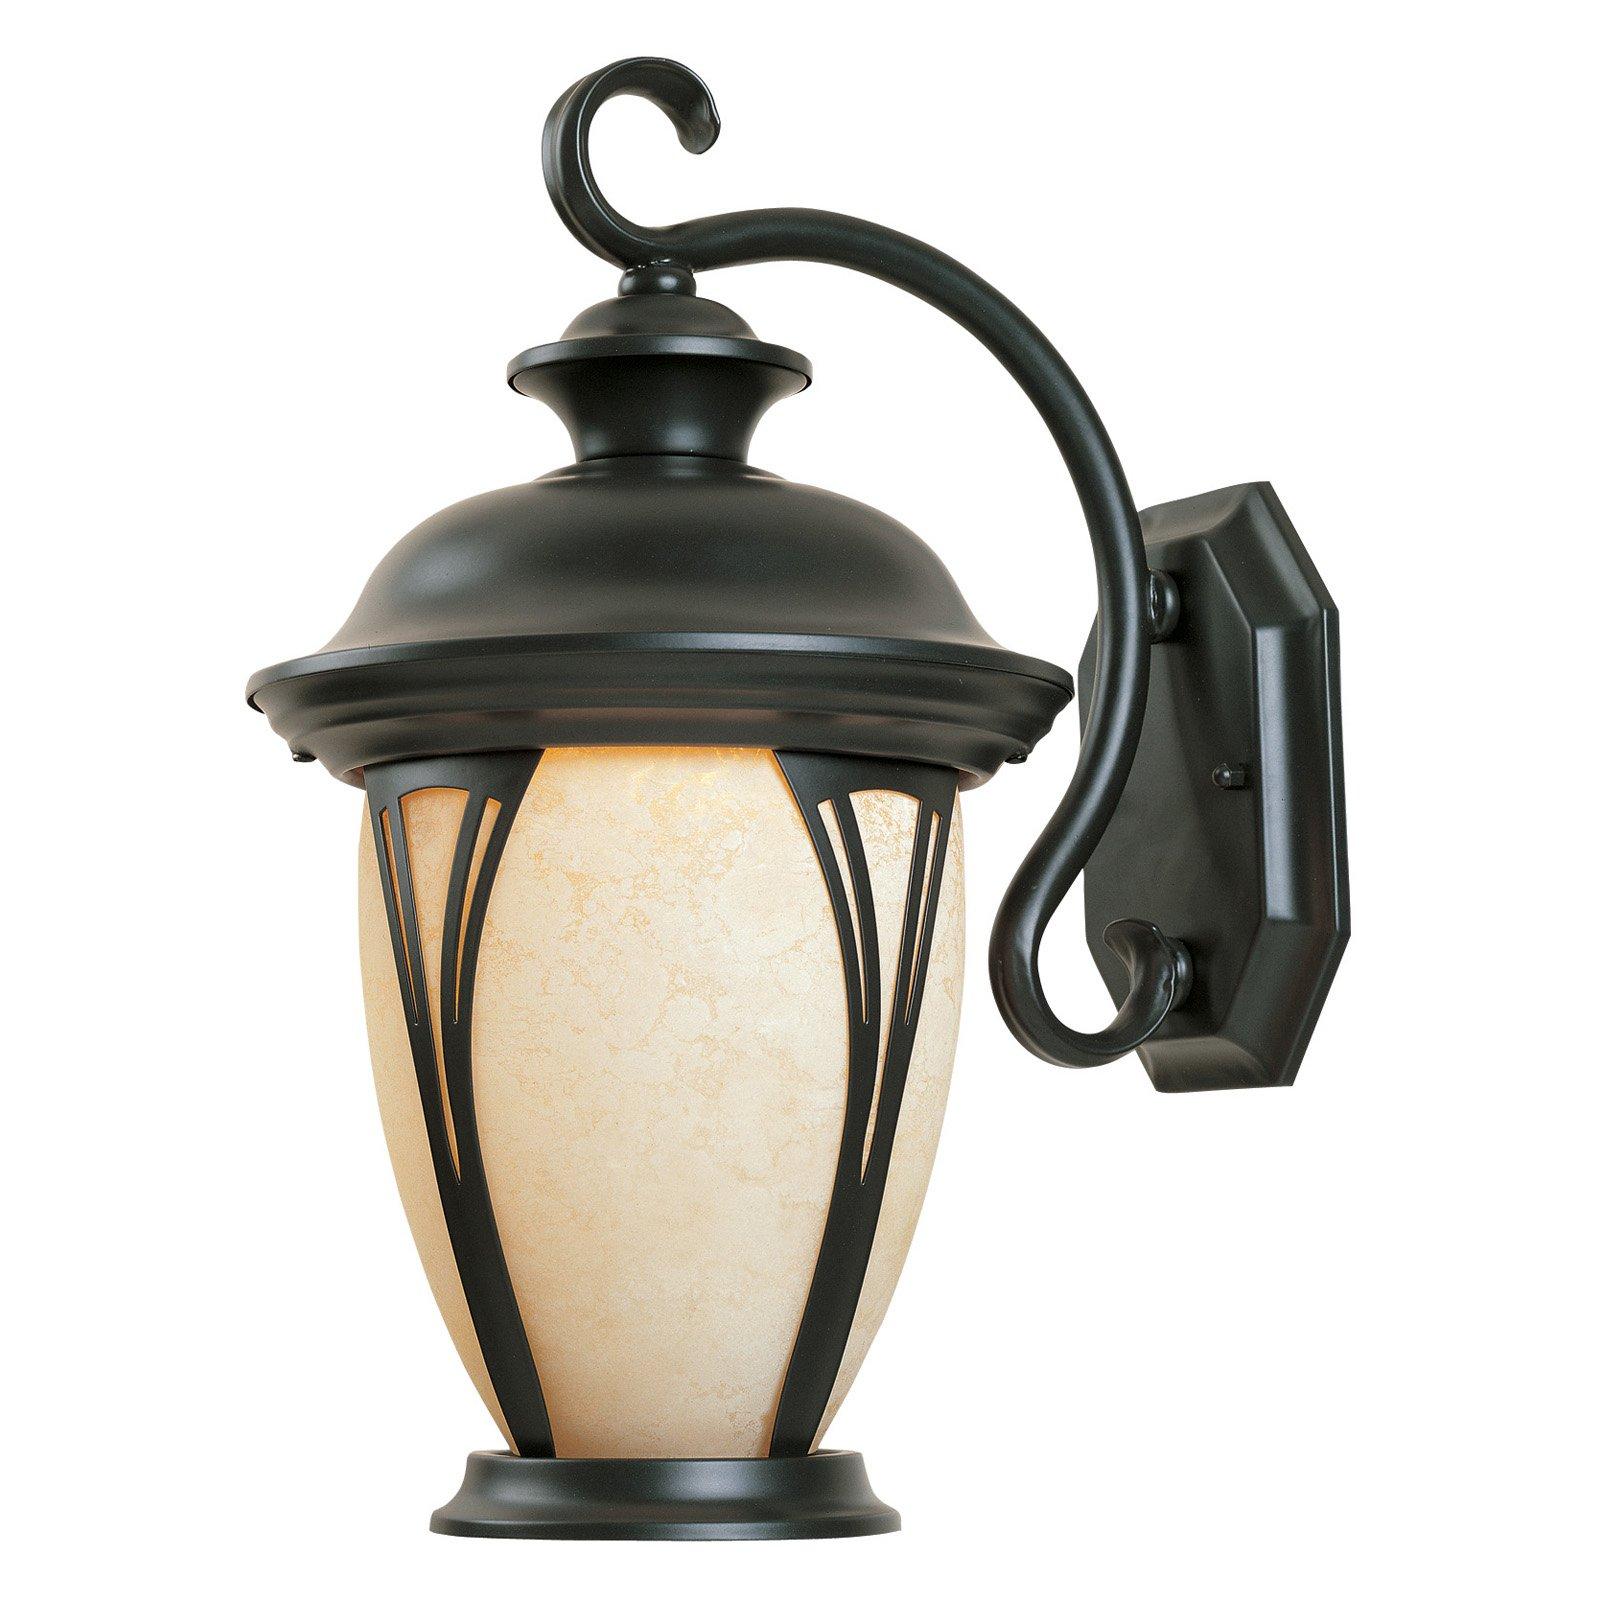 Designers Fountain Outdoor 30521-AM-BZ Westchester Wall Lantern